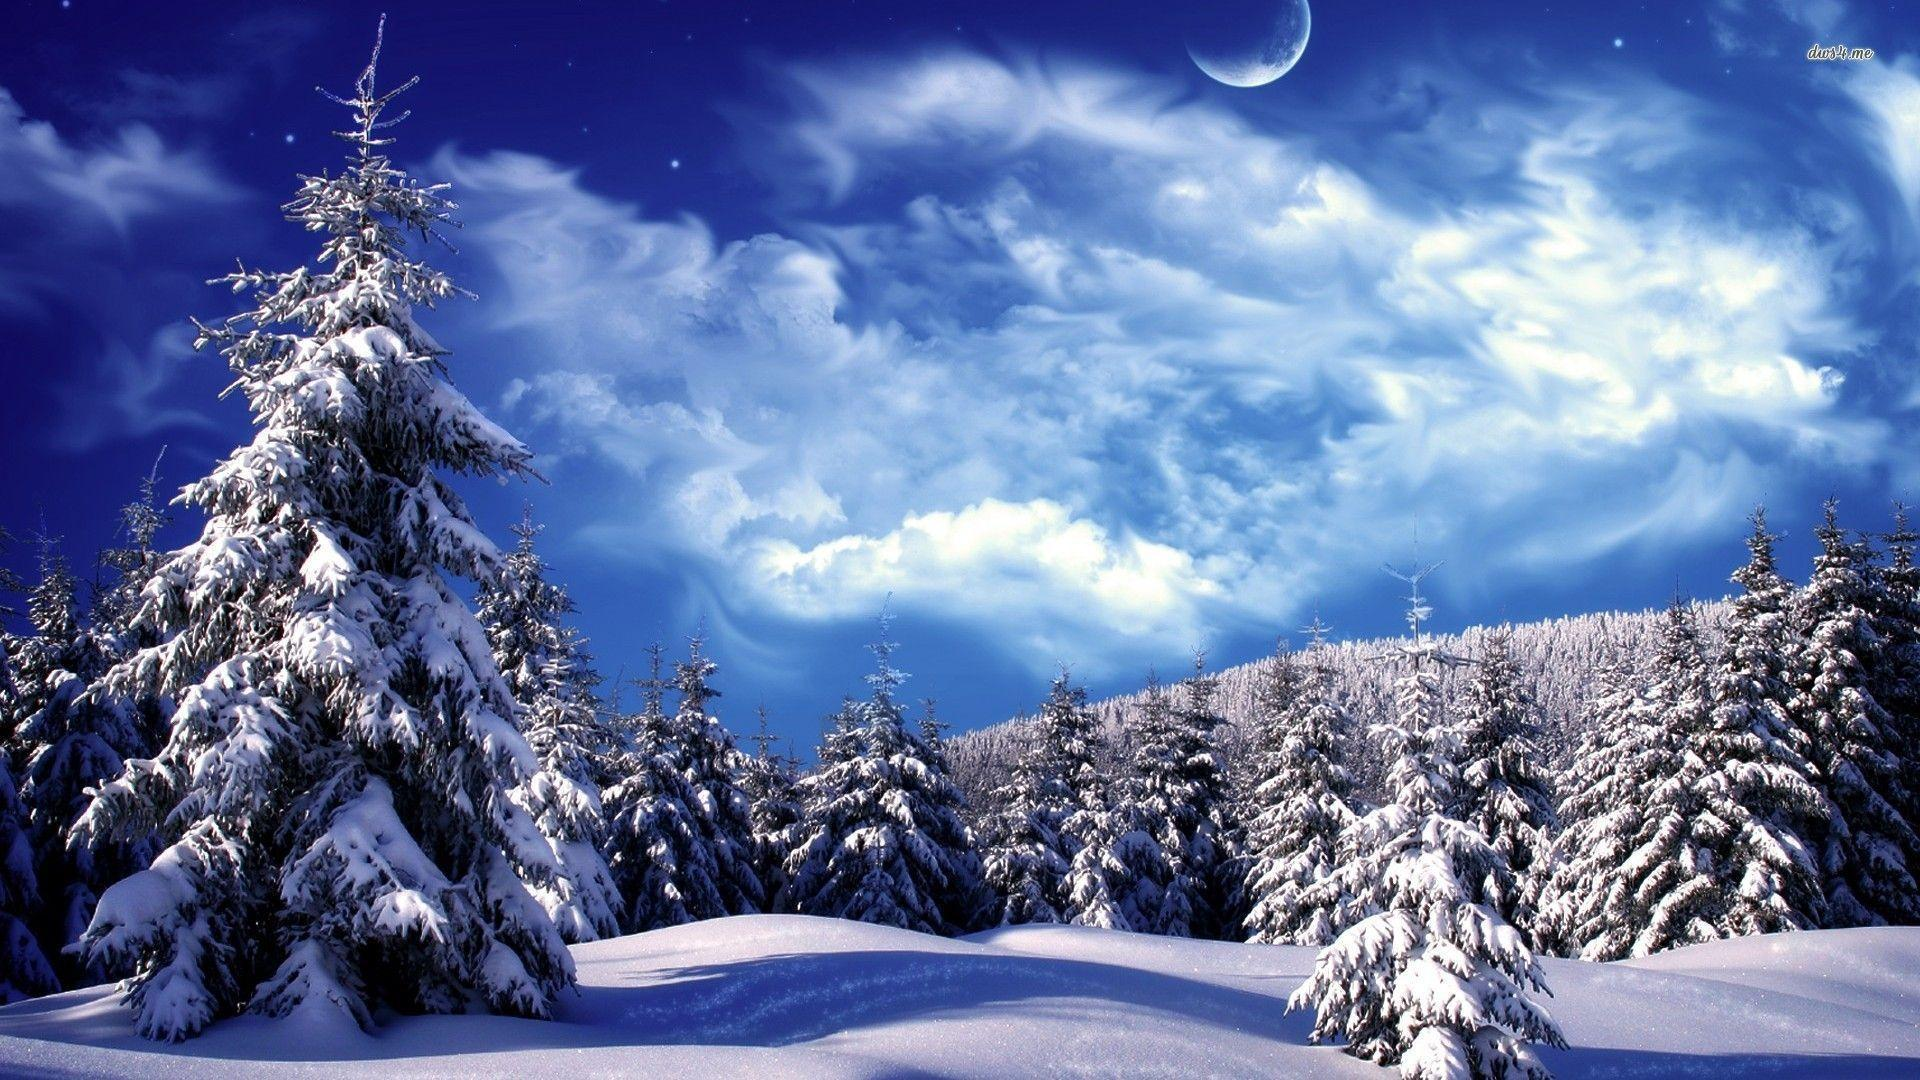 high resolution wallpaper christmas winter - photo #31